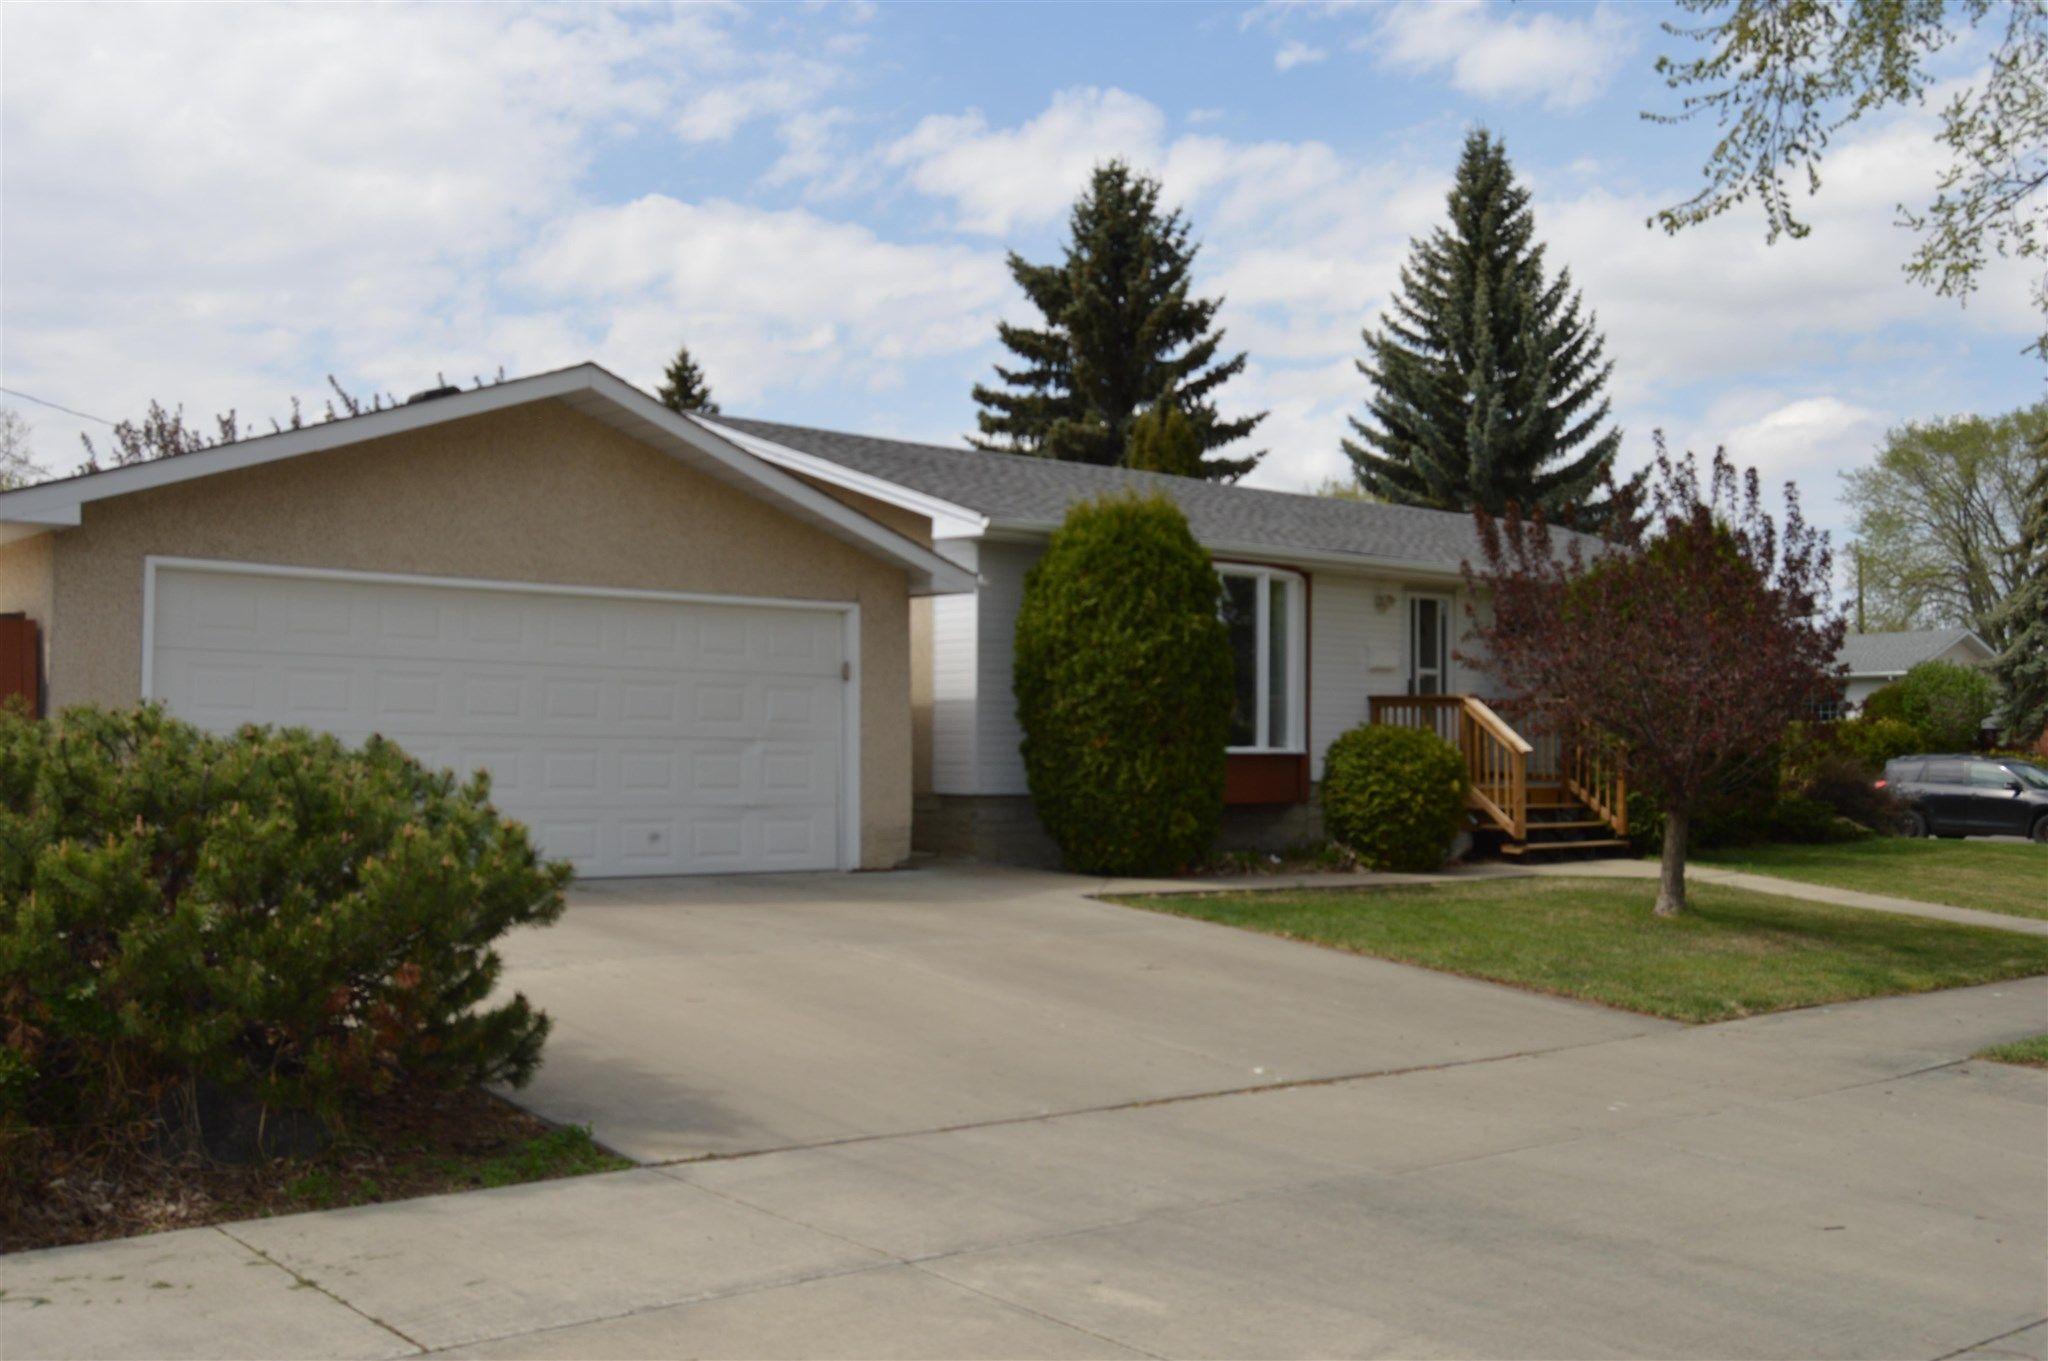 Main Photo: 9430 160 Street in Edmonton: Zone 22 House for sale : MLS®# E4245408